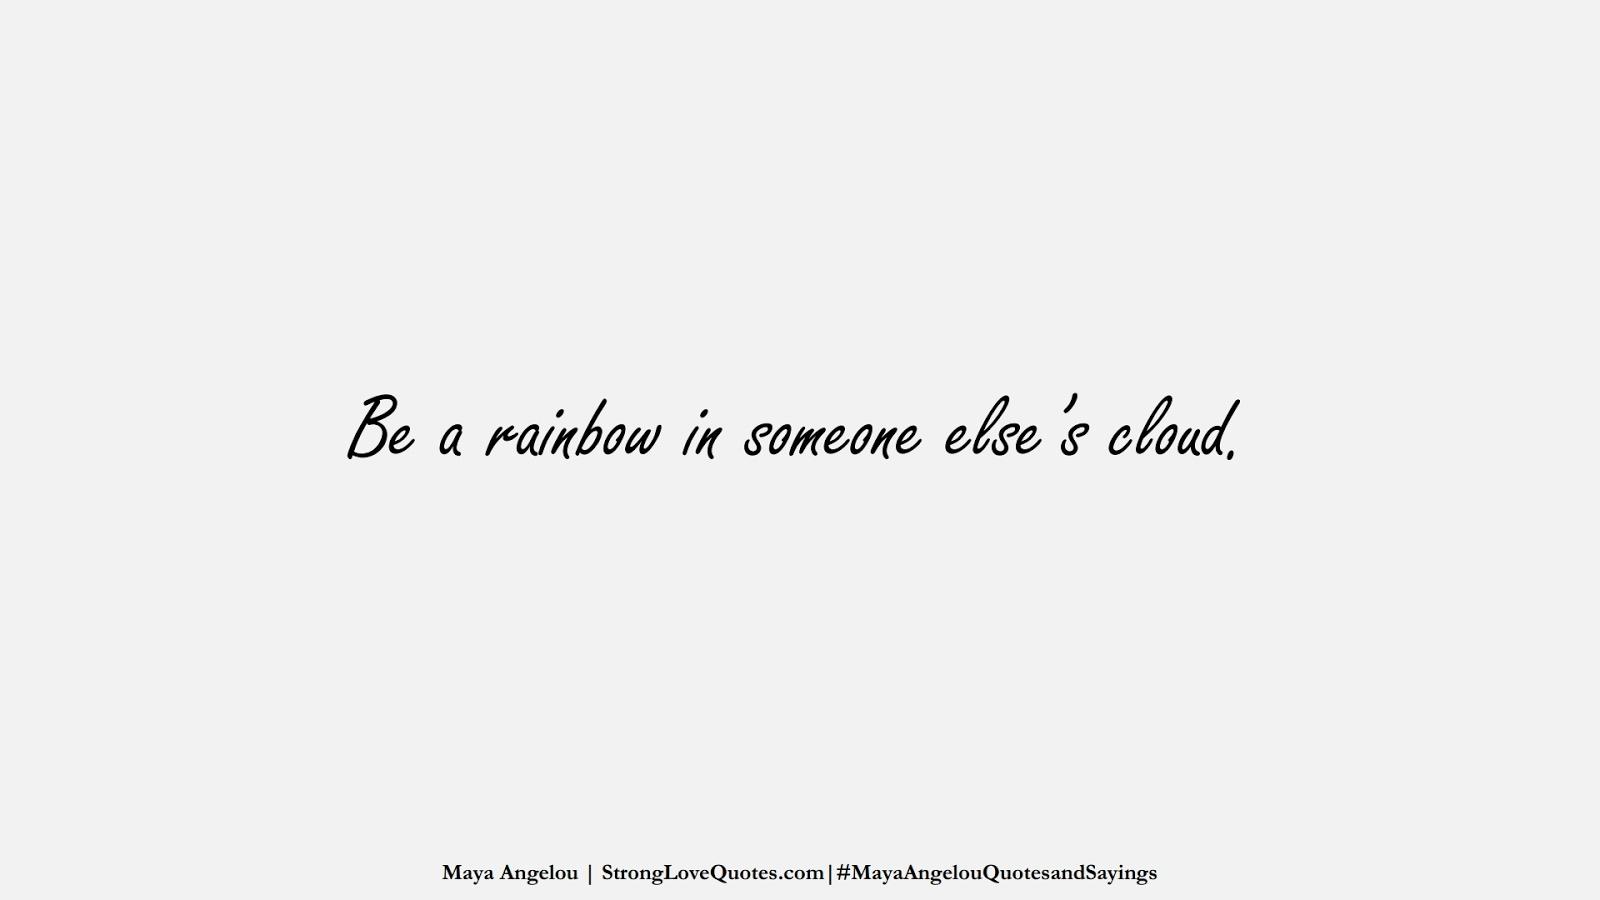 Be a rainbow in someone else's cloud. (Maya Angelou);  #MayaAngelouQuotesandSayings